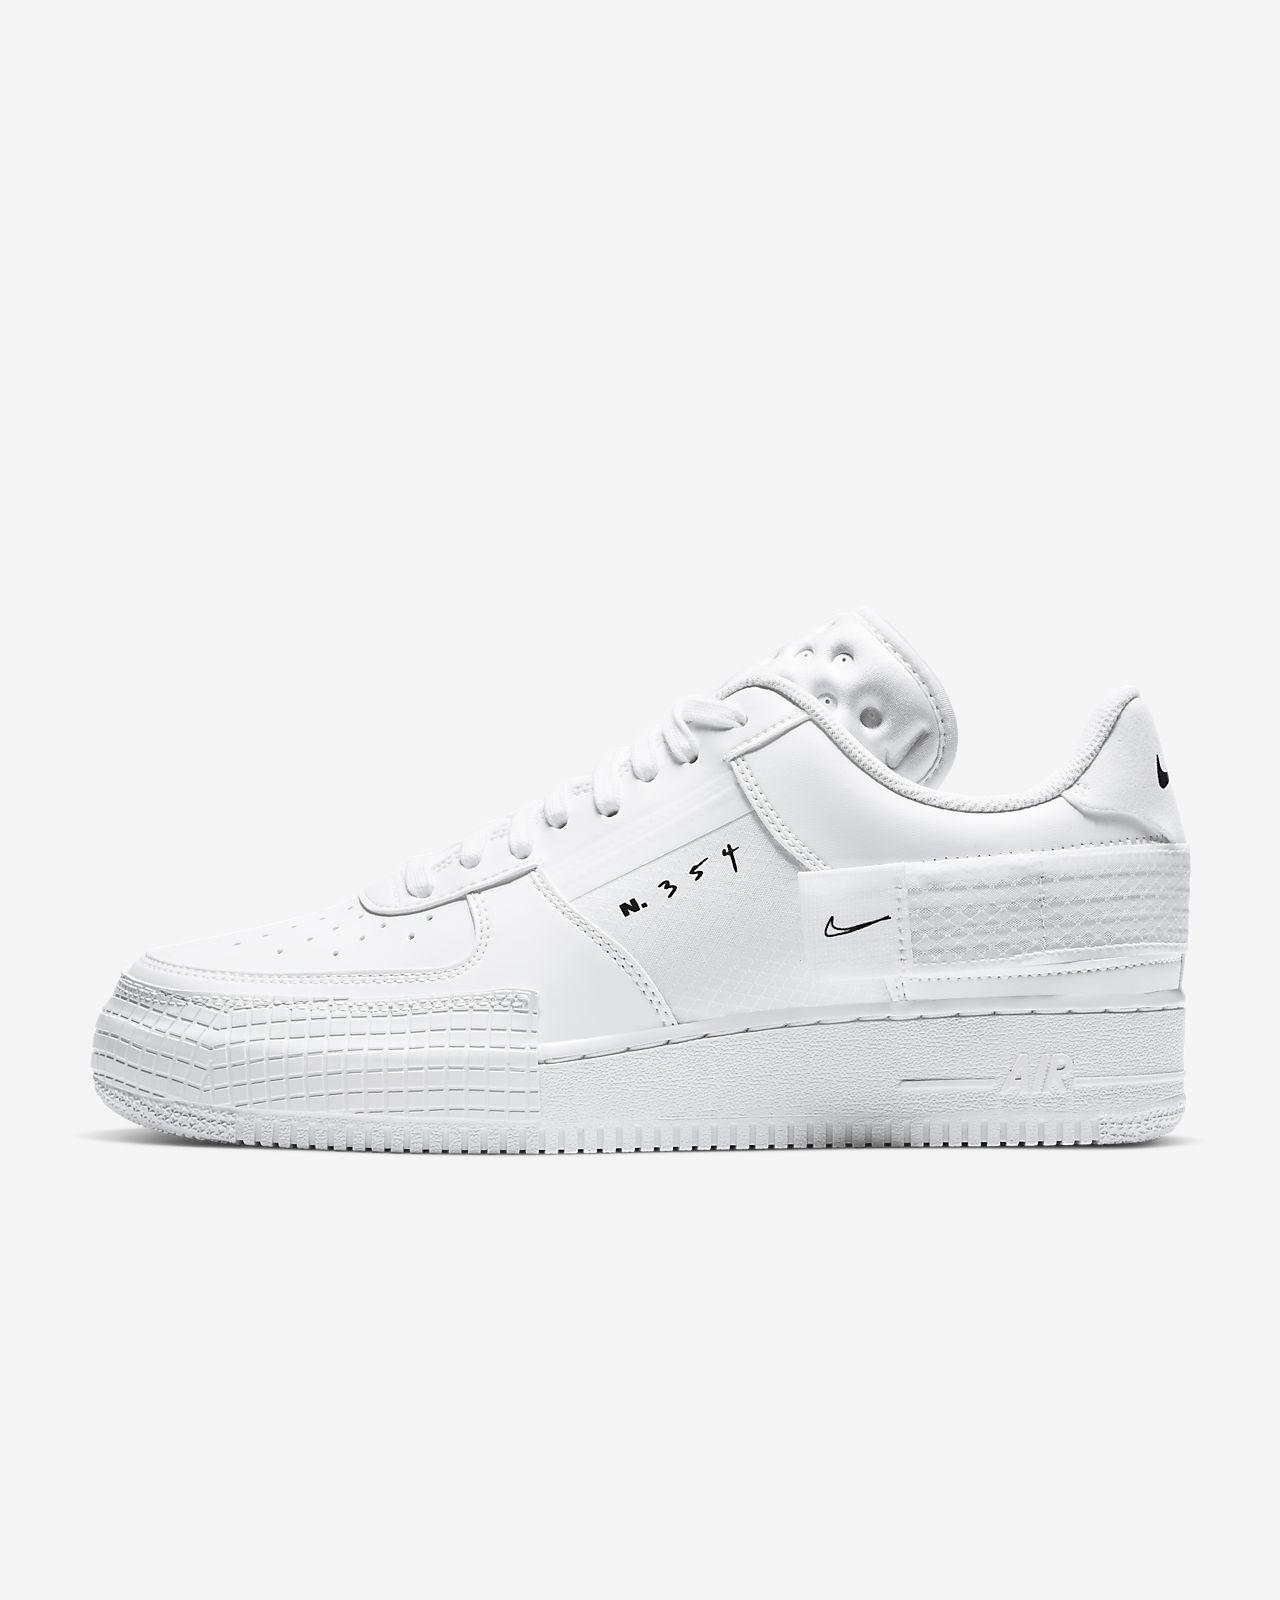 Män Nike Sportswear Livsstil Skor. SE.